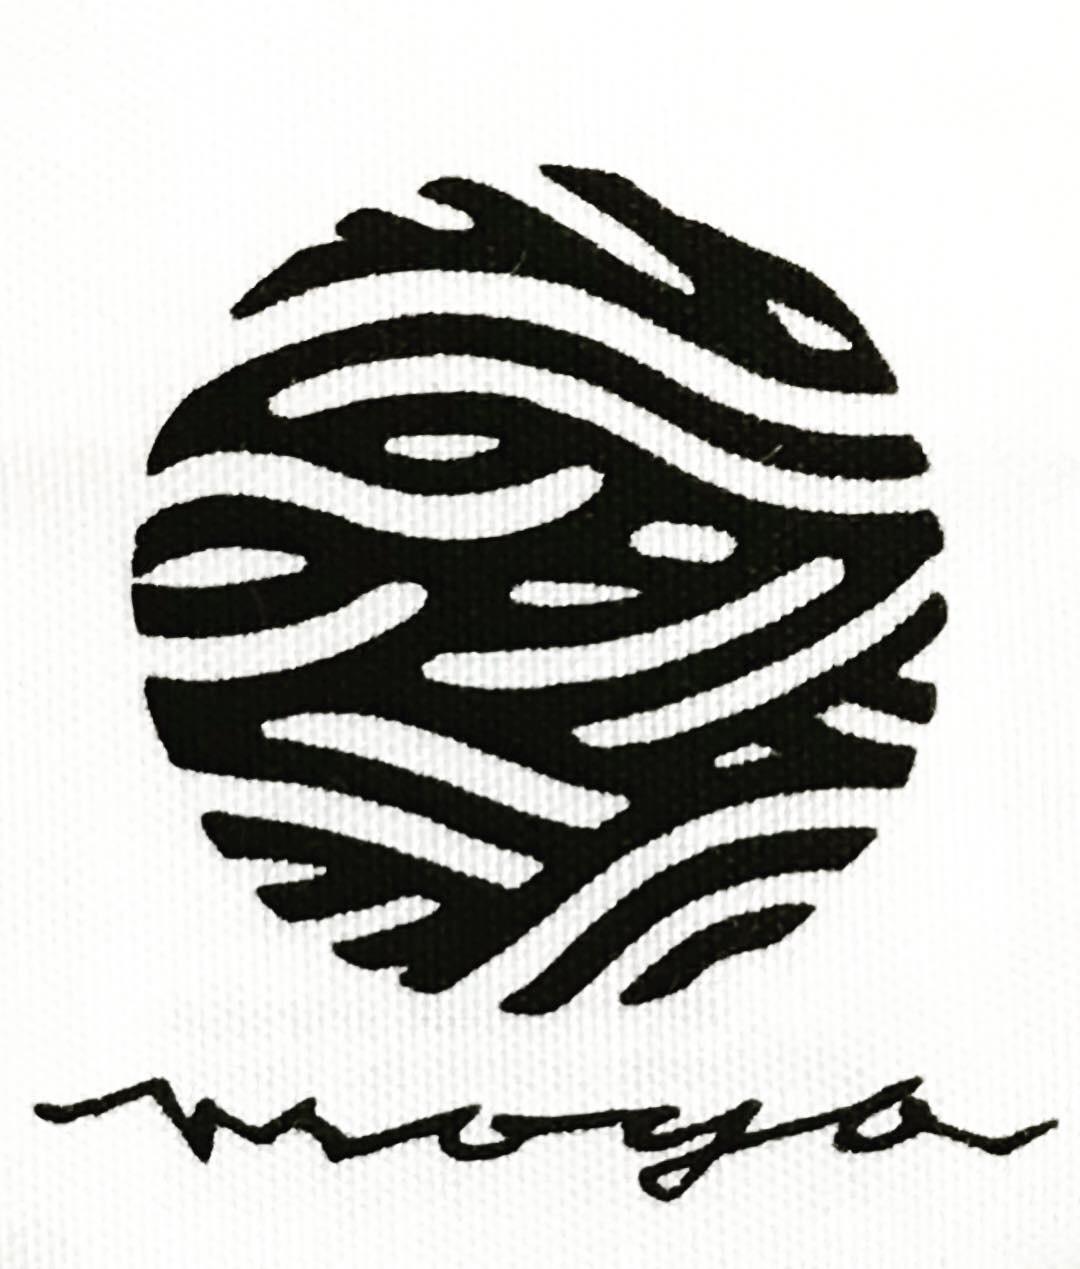 MOYA ART